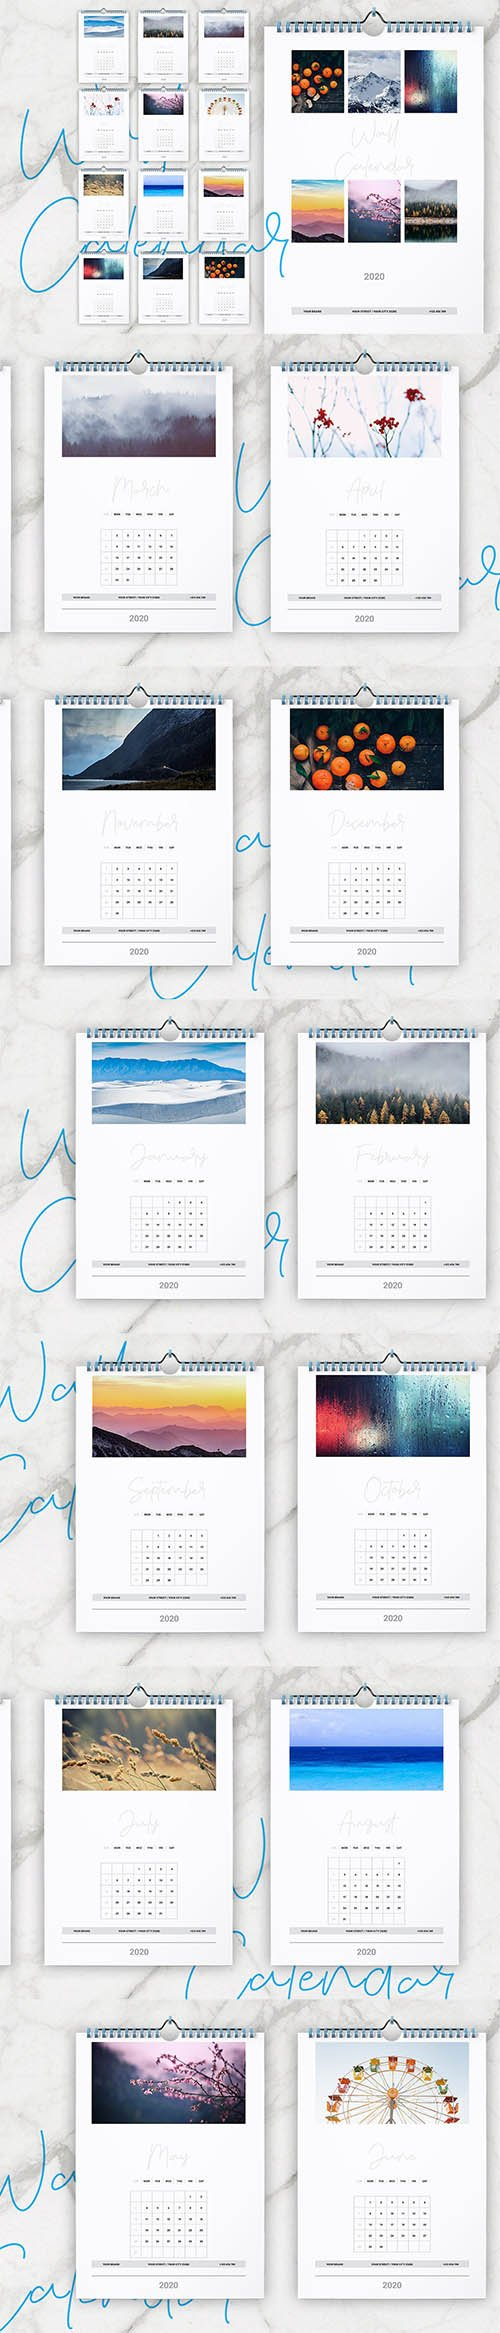 Wall Calendar 2020 Layout INDD